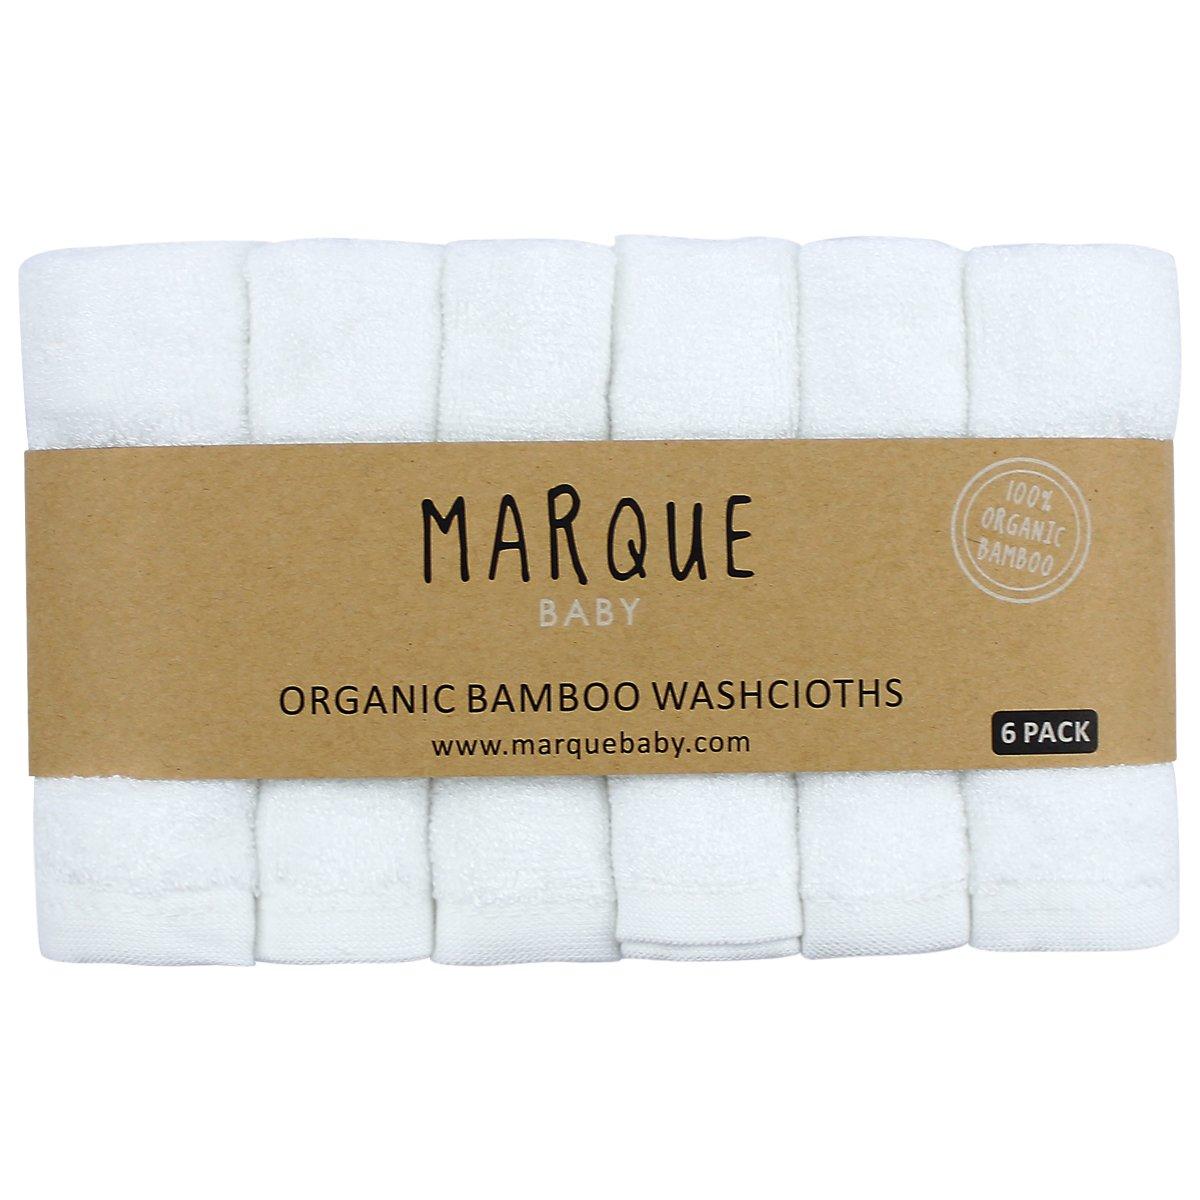 100% Organic Bamboo Cotton Baby Washcloths - 6pcs NO DYES Super Soft & Absorbent Bath Towels 10